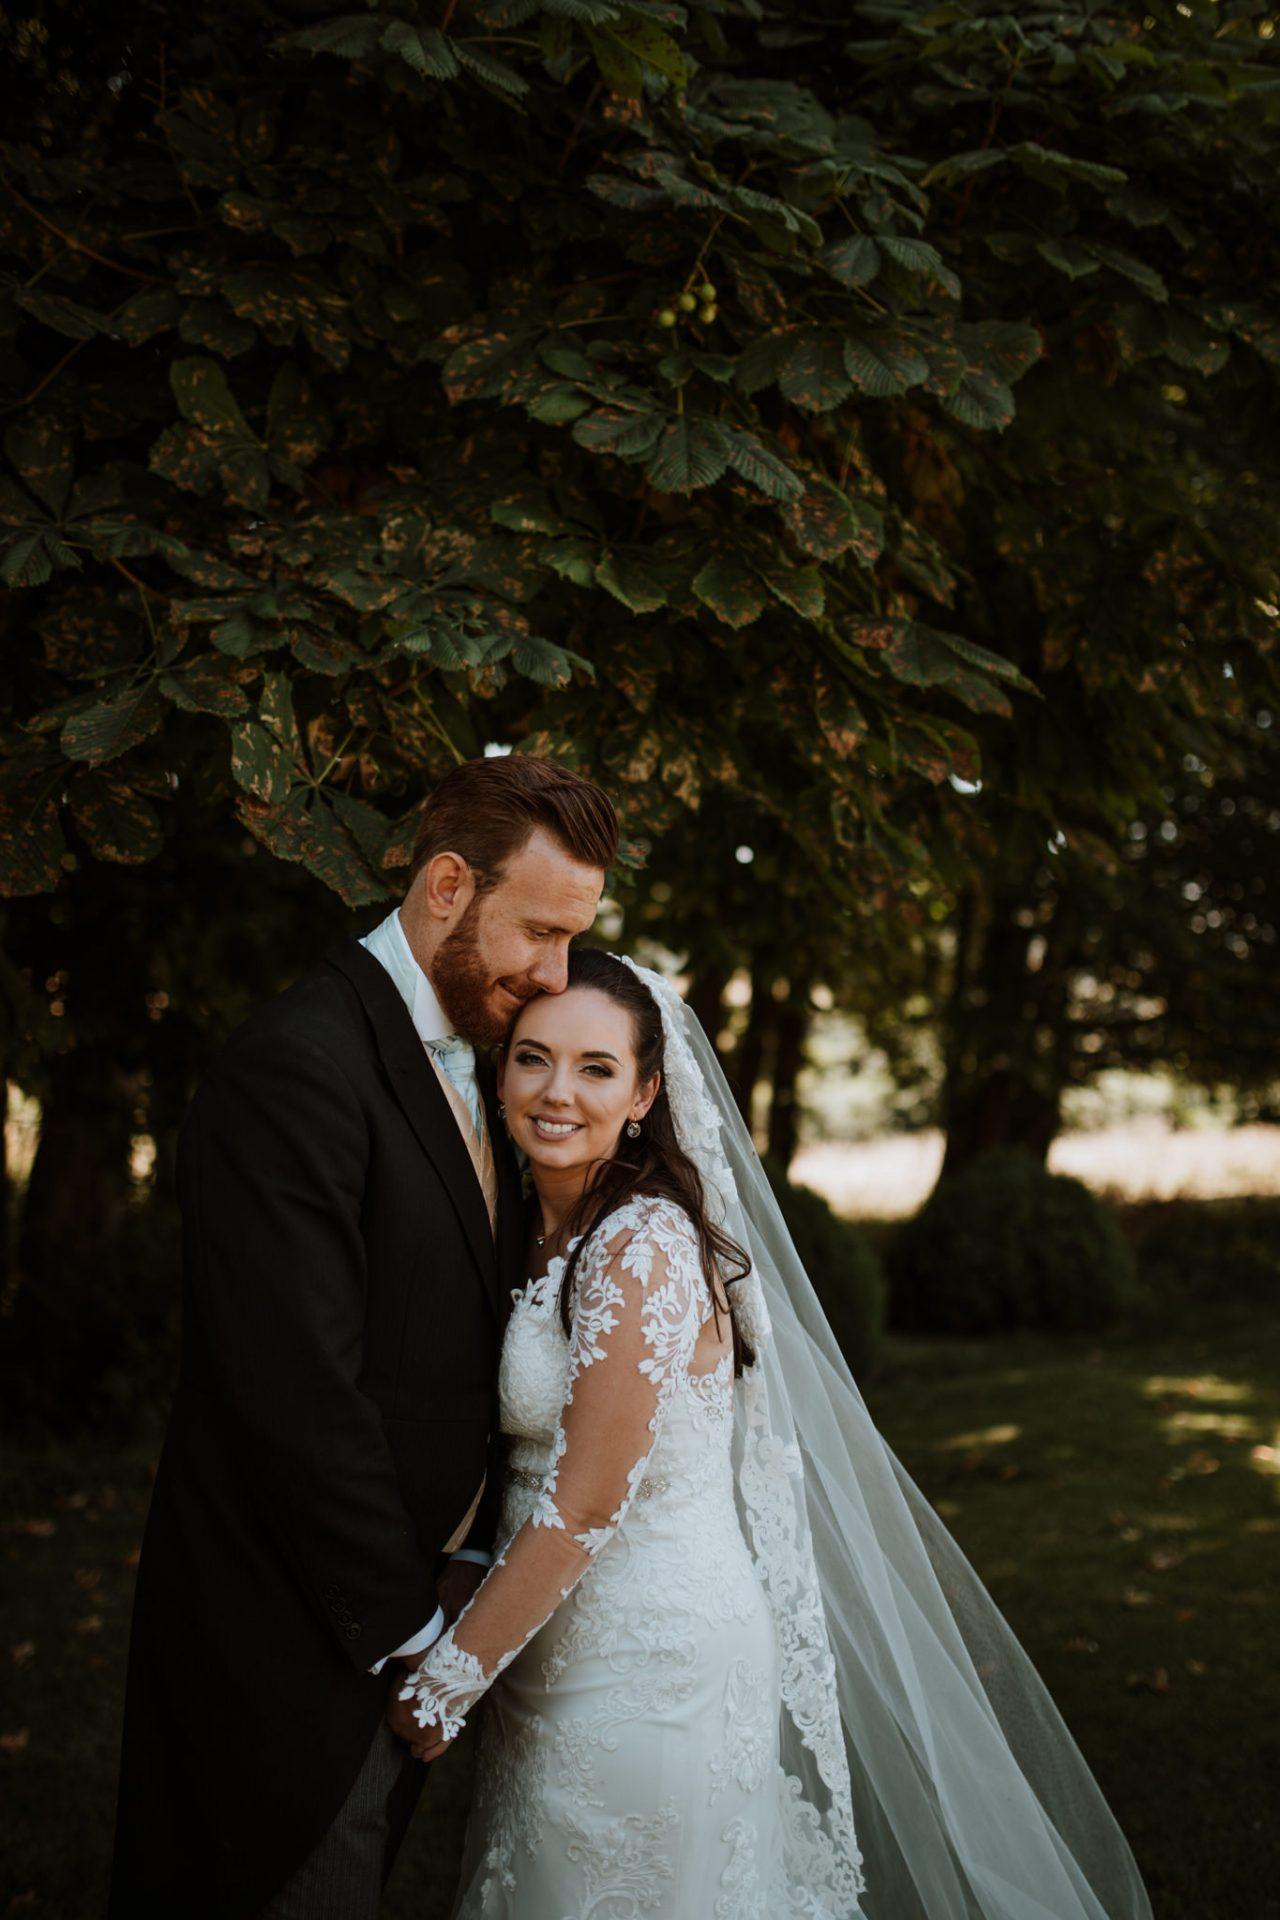 couples portraits bristol wedding photographer the grange belluton wedding